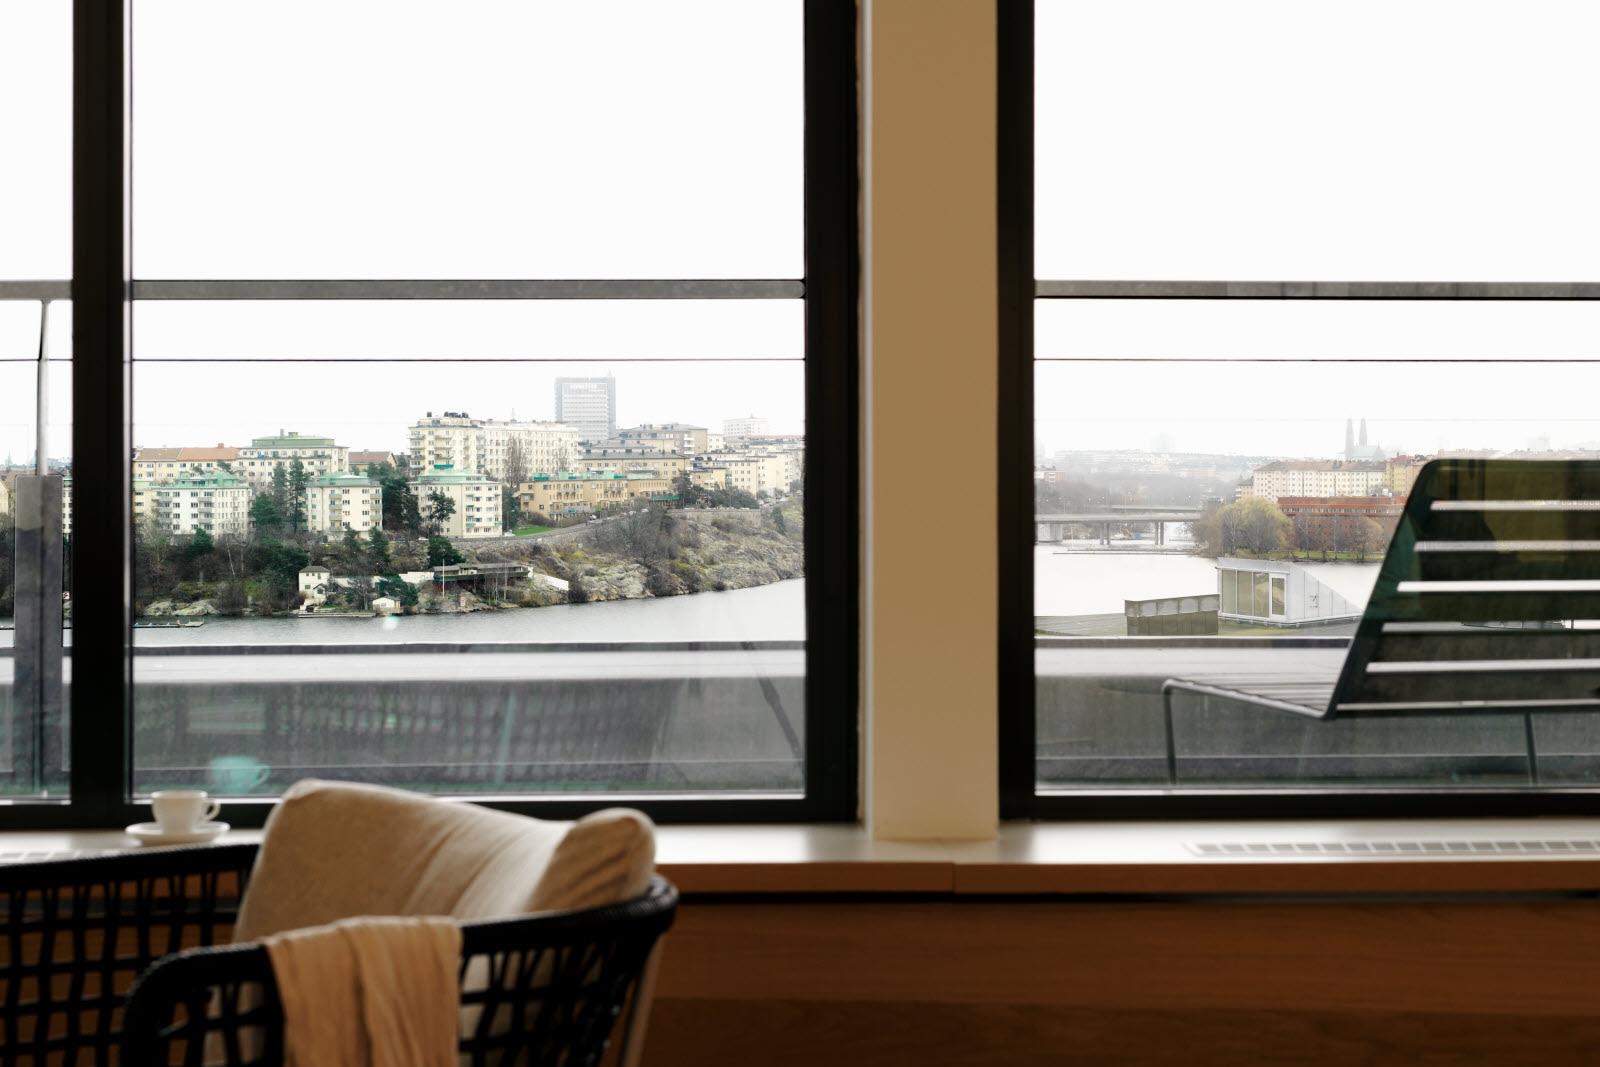 scandic alvik karta Scandic Alvik | Hotel Stockholm | Scandic Hotels scandic alvik karta